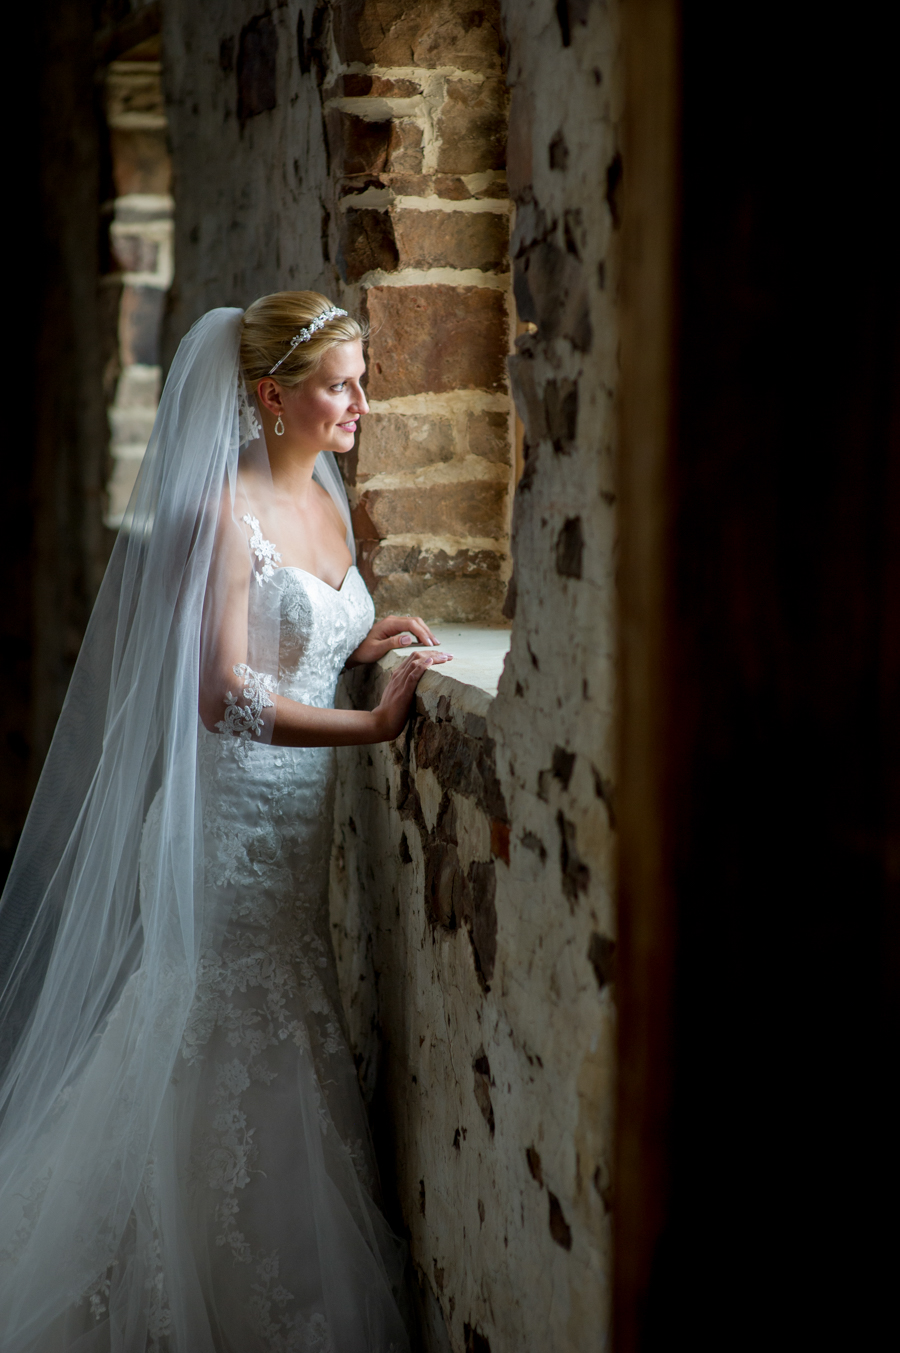 Herman-Luthers-Wedding-Photographer-33.jpg